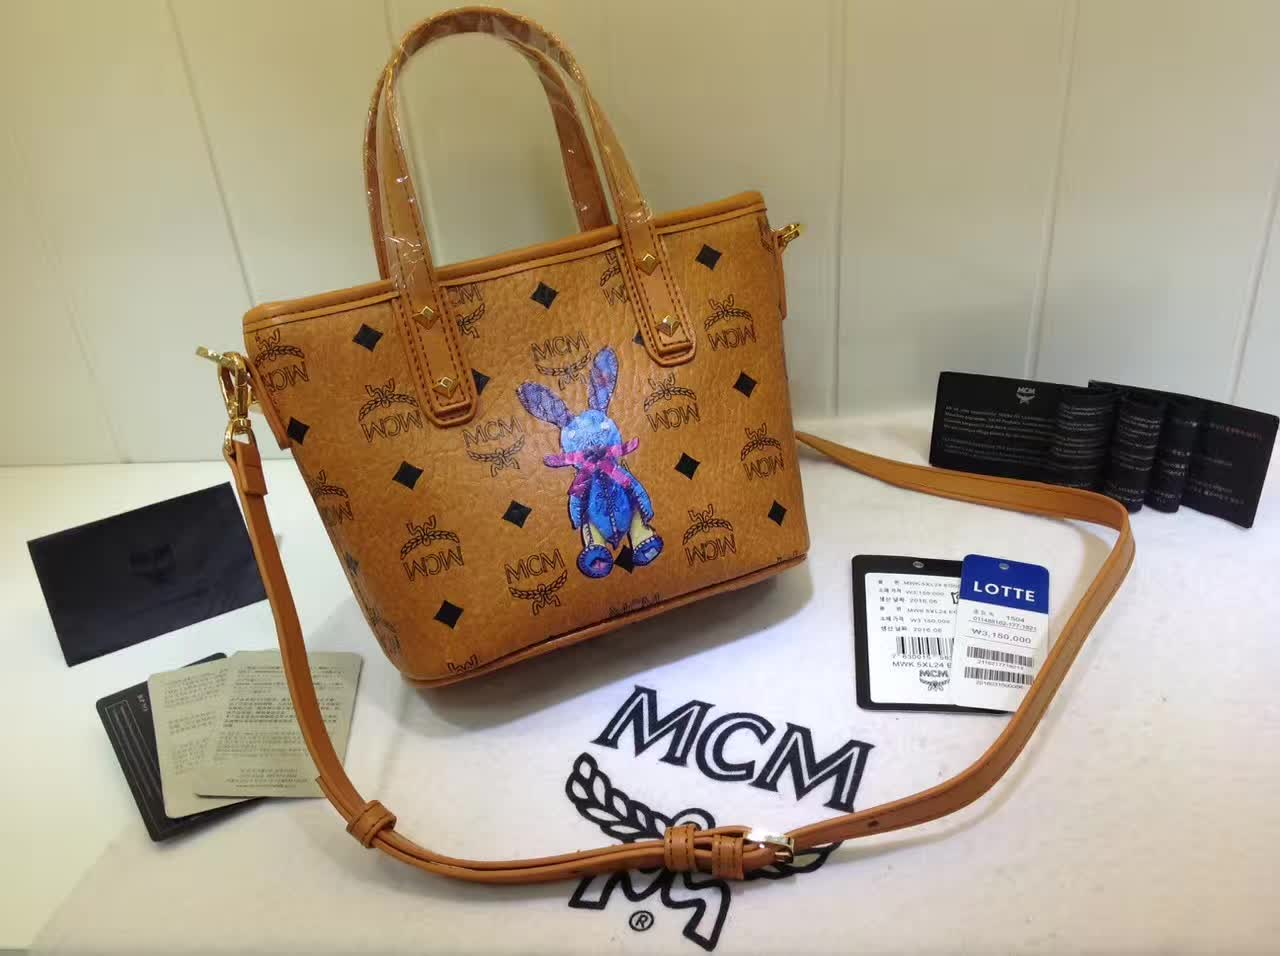 MCM包包批发 2017专柜新款 兔子购物袋造型mini斜挎包 土黄